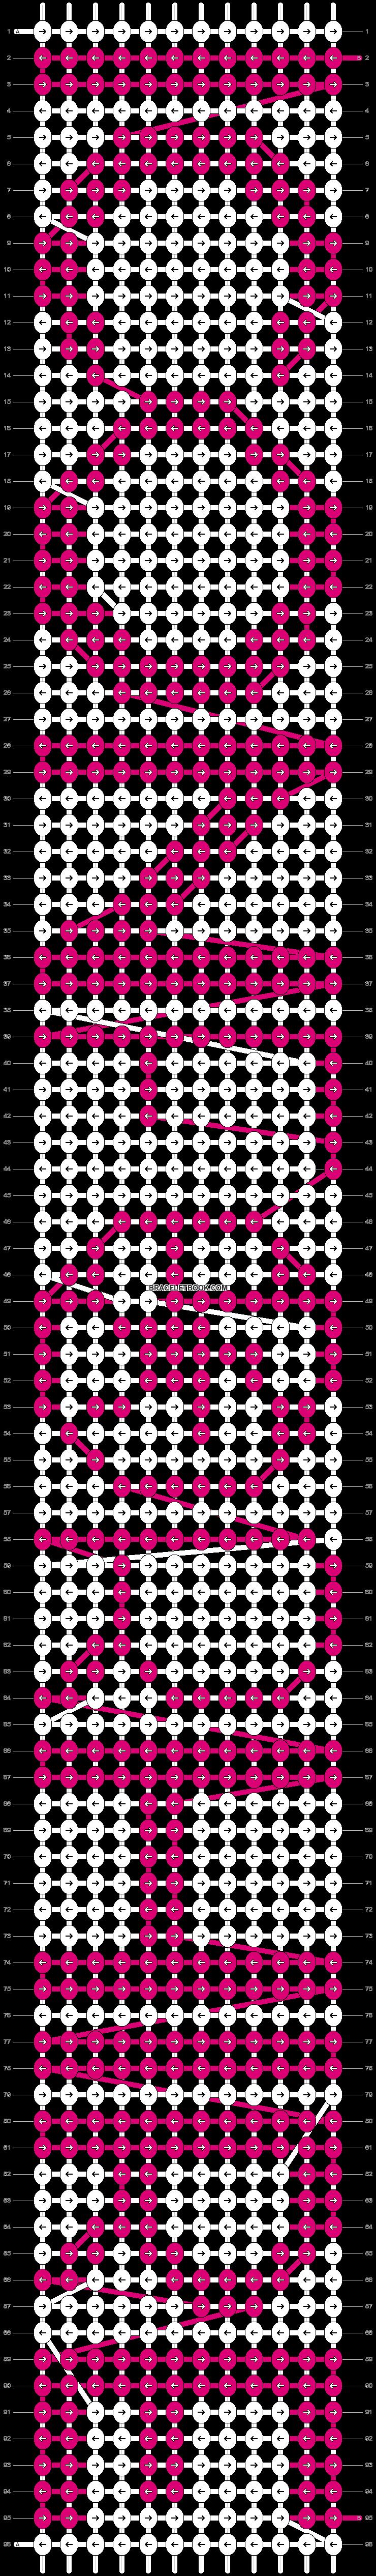 Alpha pattern #8092 pattern